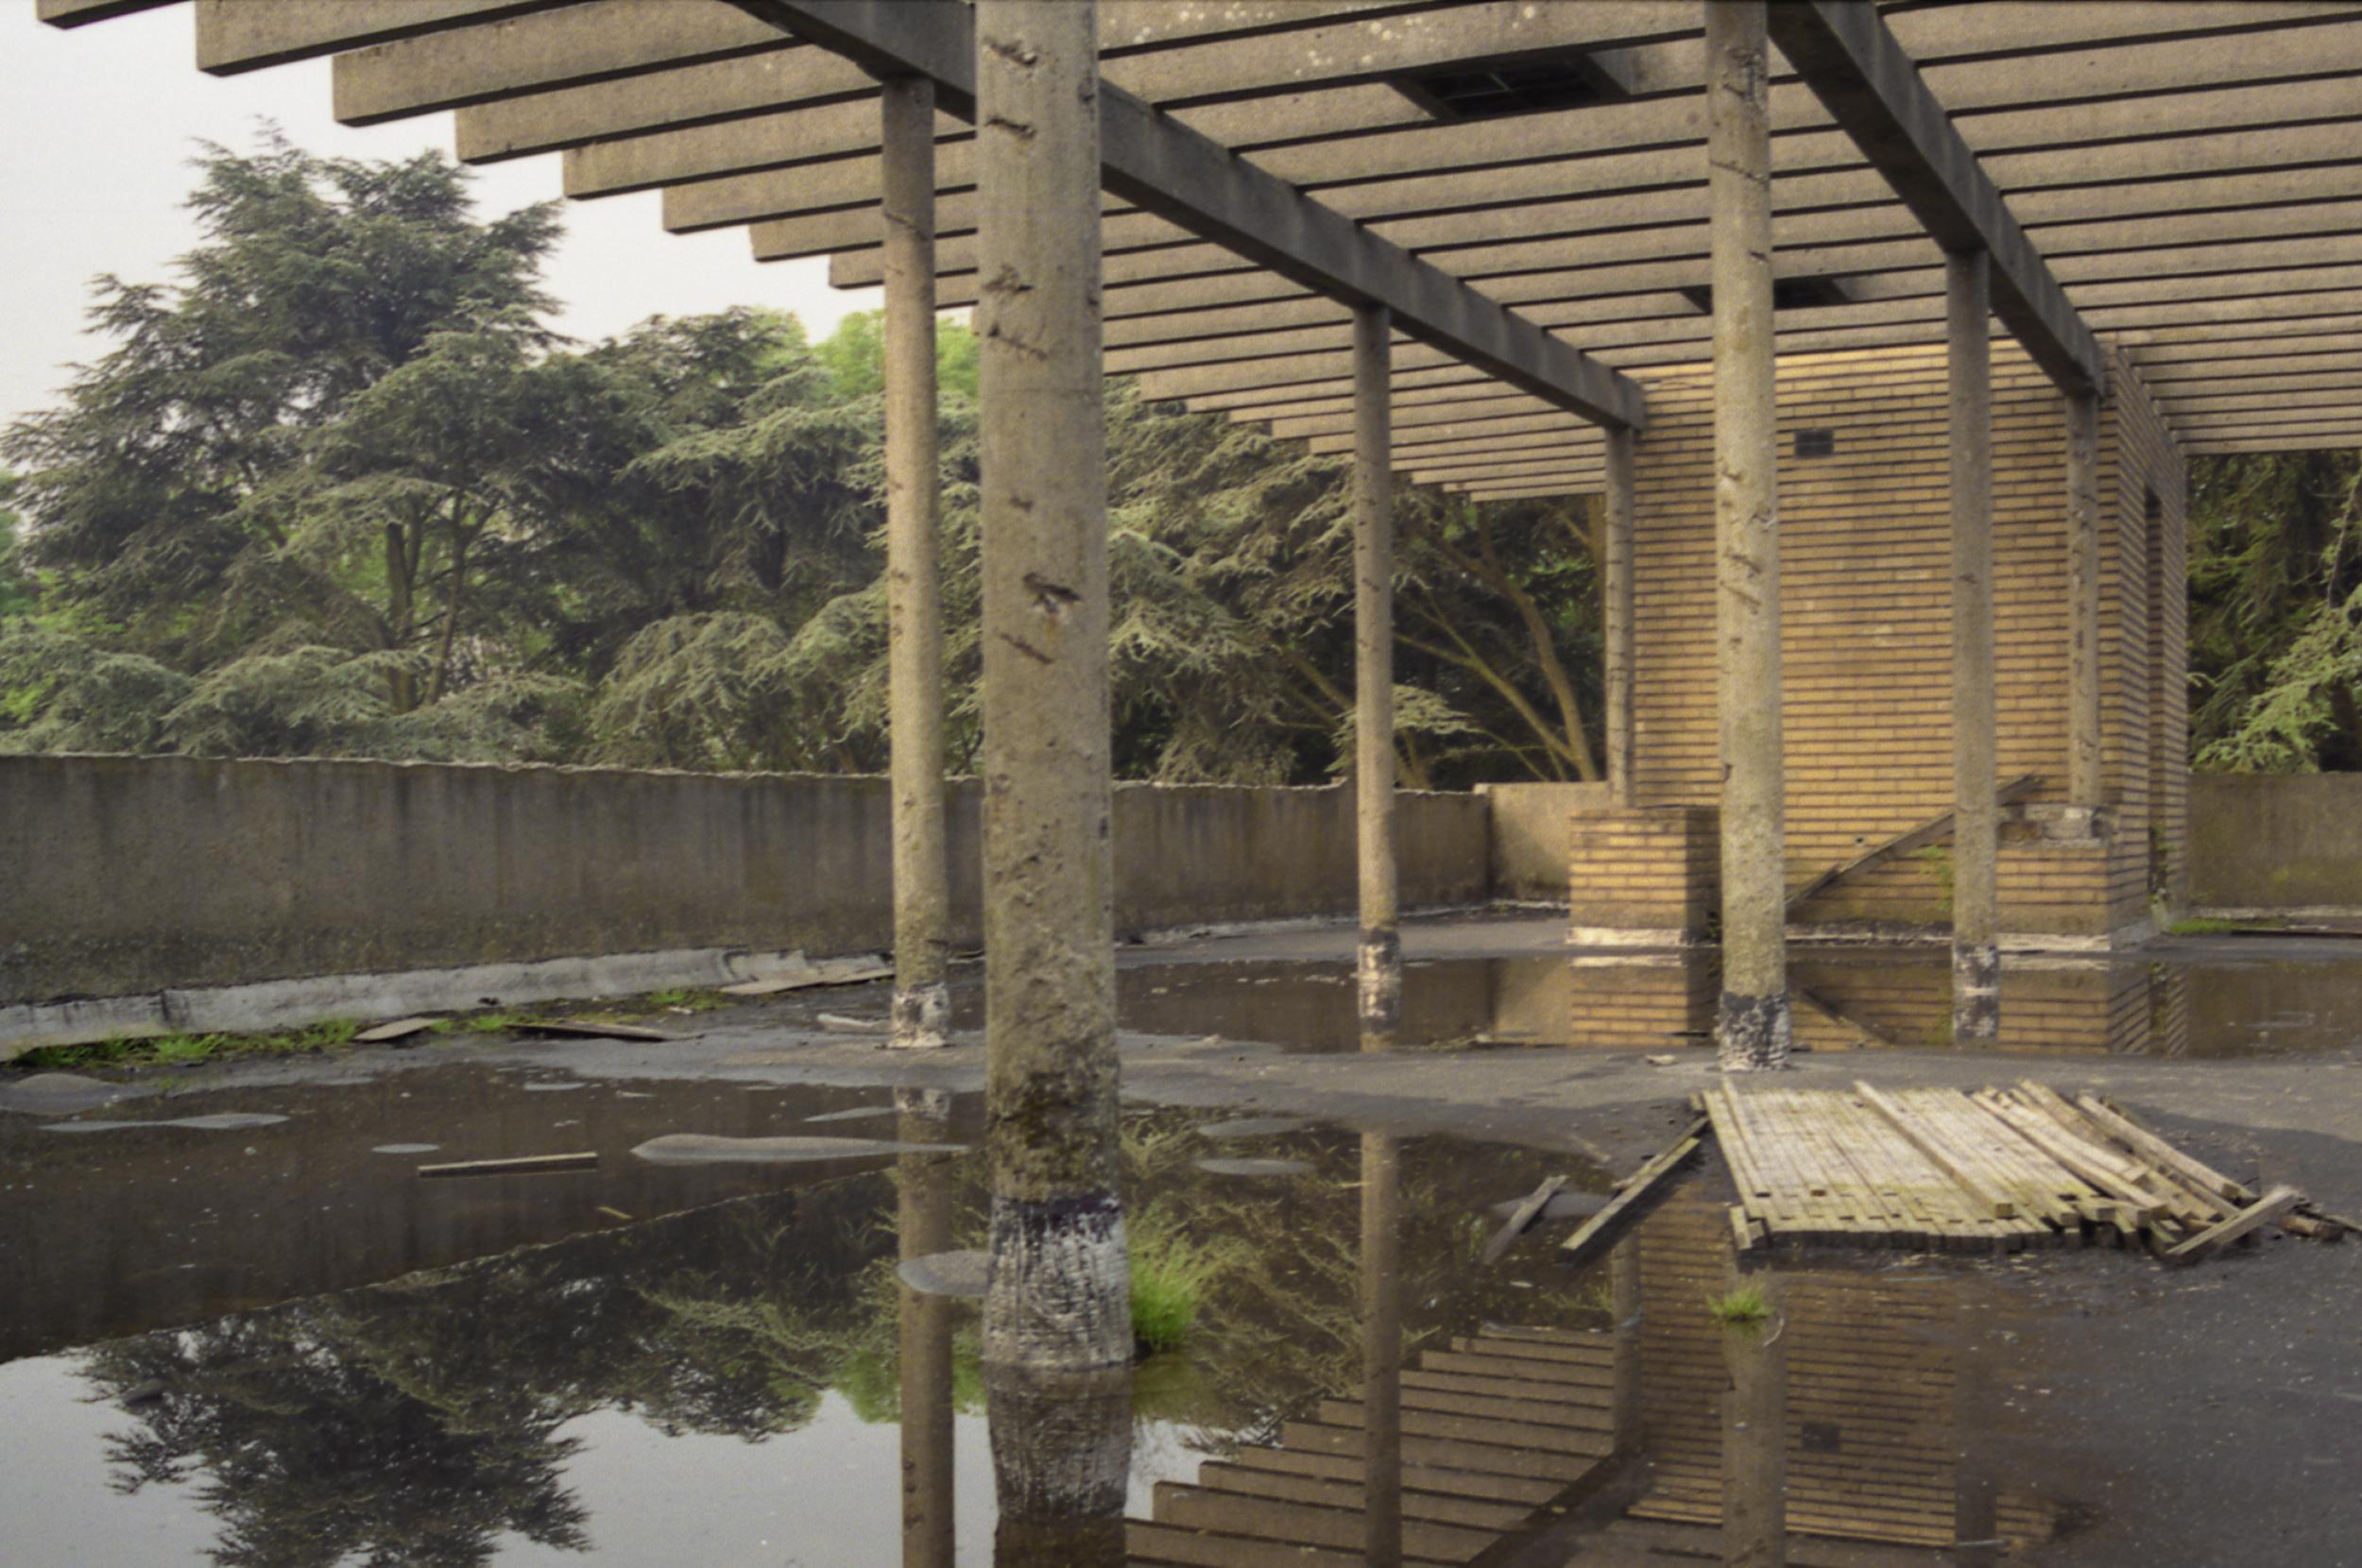 Villa Cavrois, 2000 |  | ProjecteSD